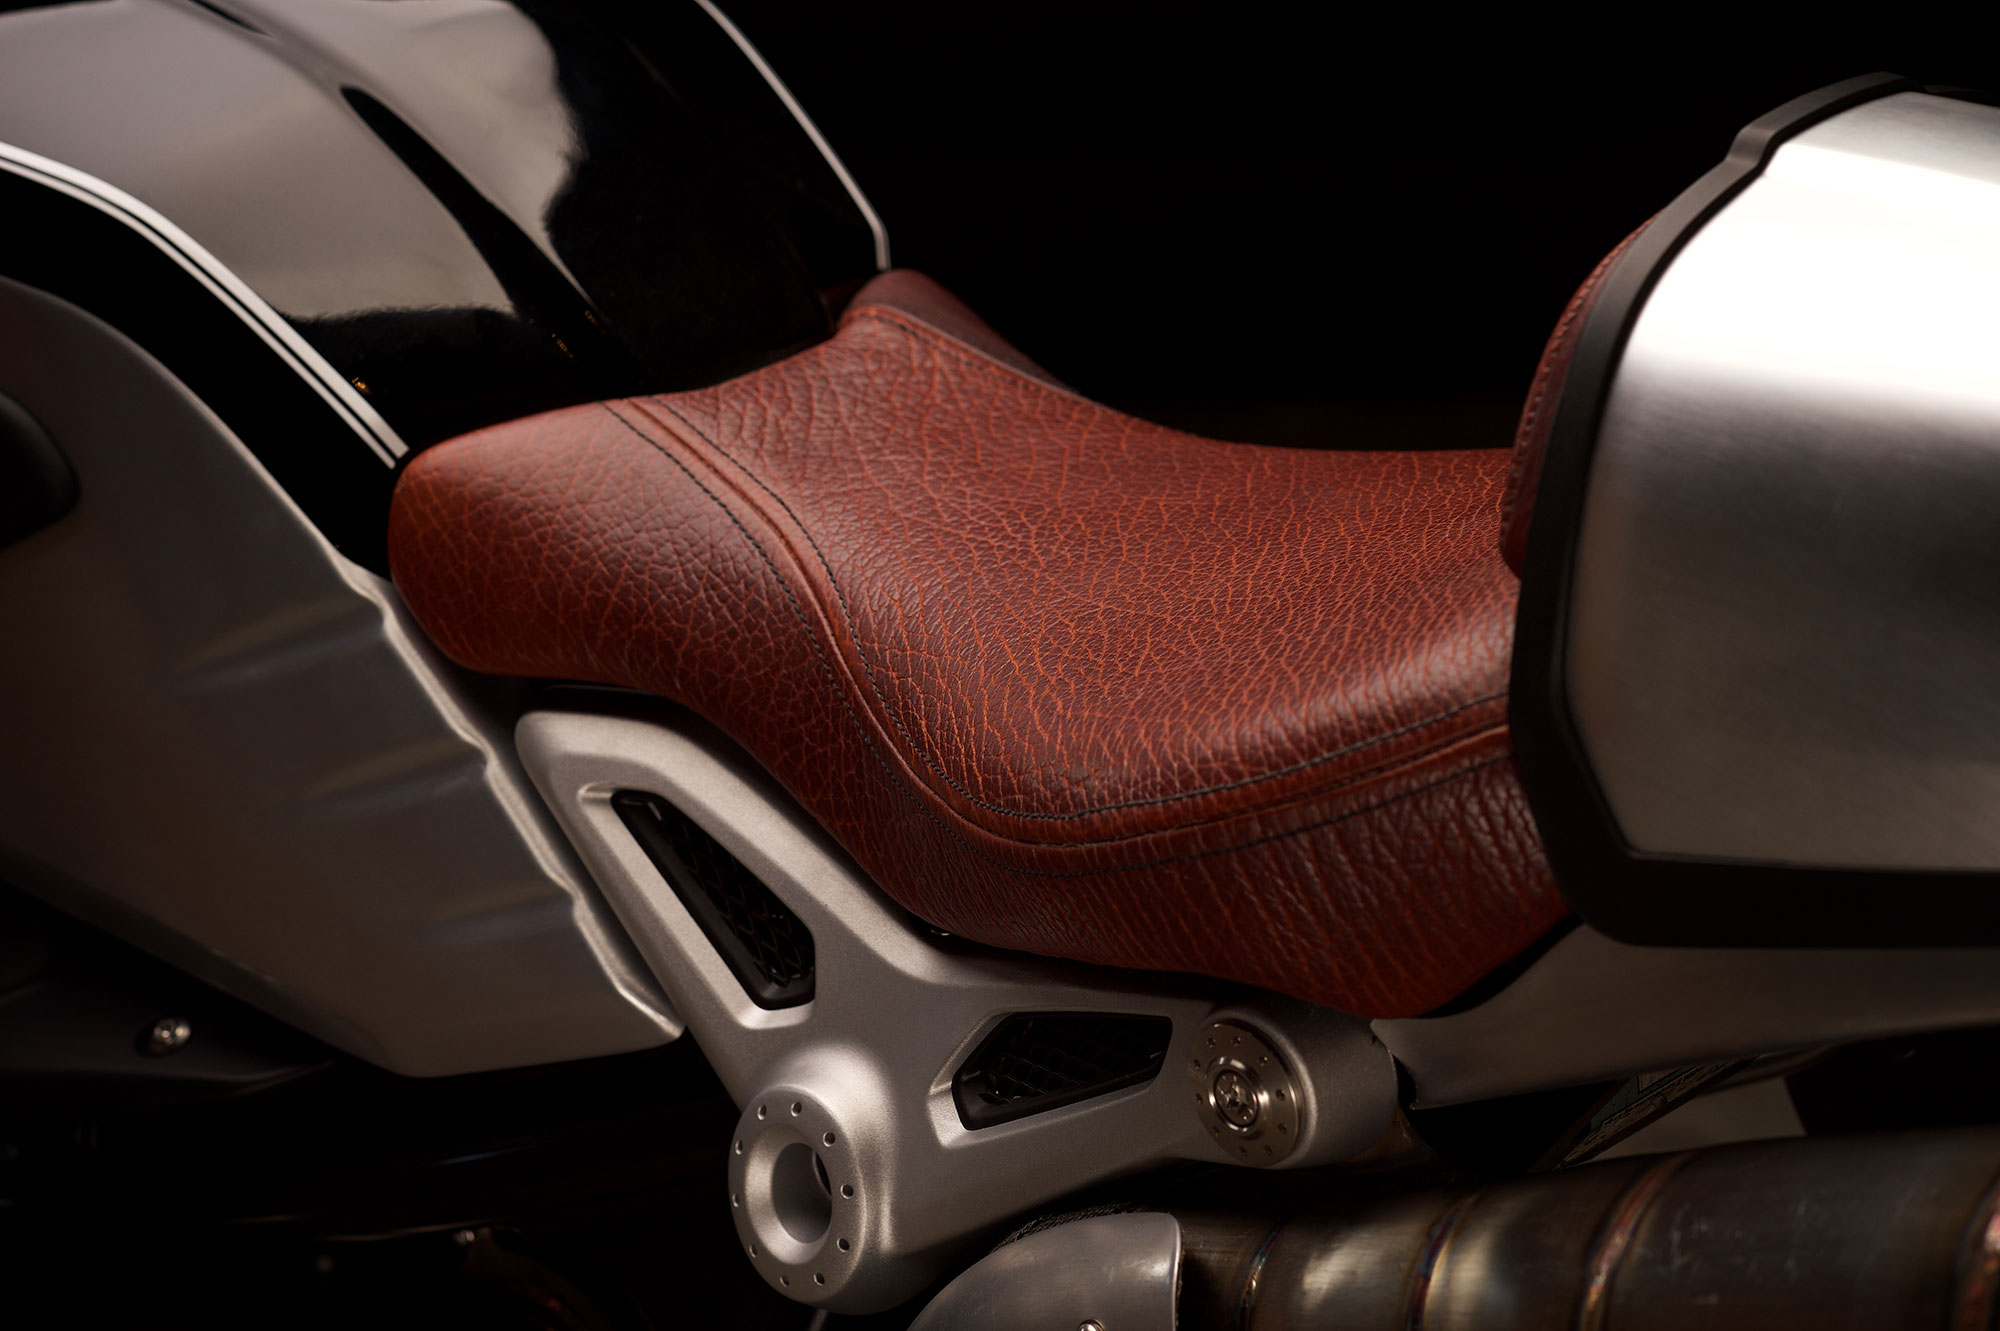 Revival-Cycles-Custom-Build-2014-BMW-RNineT-v2-061-2000w.jpg